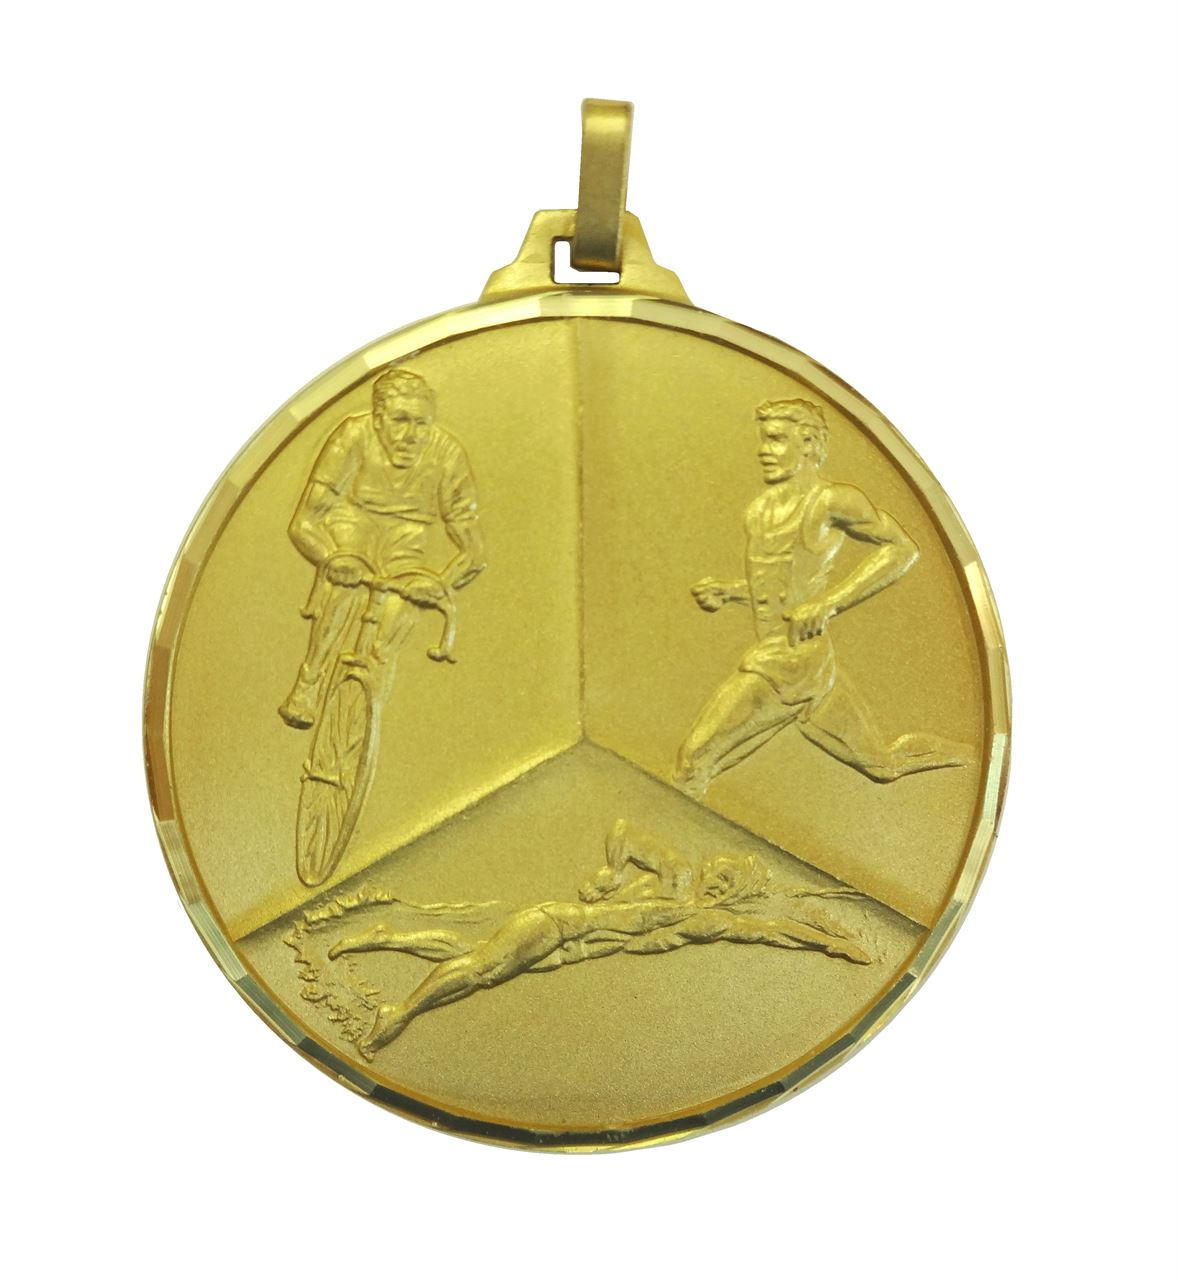 Gold Faceted Triathlon Medal (size: 42mm) - 339F/42G